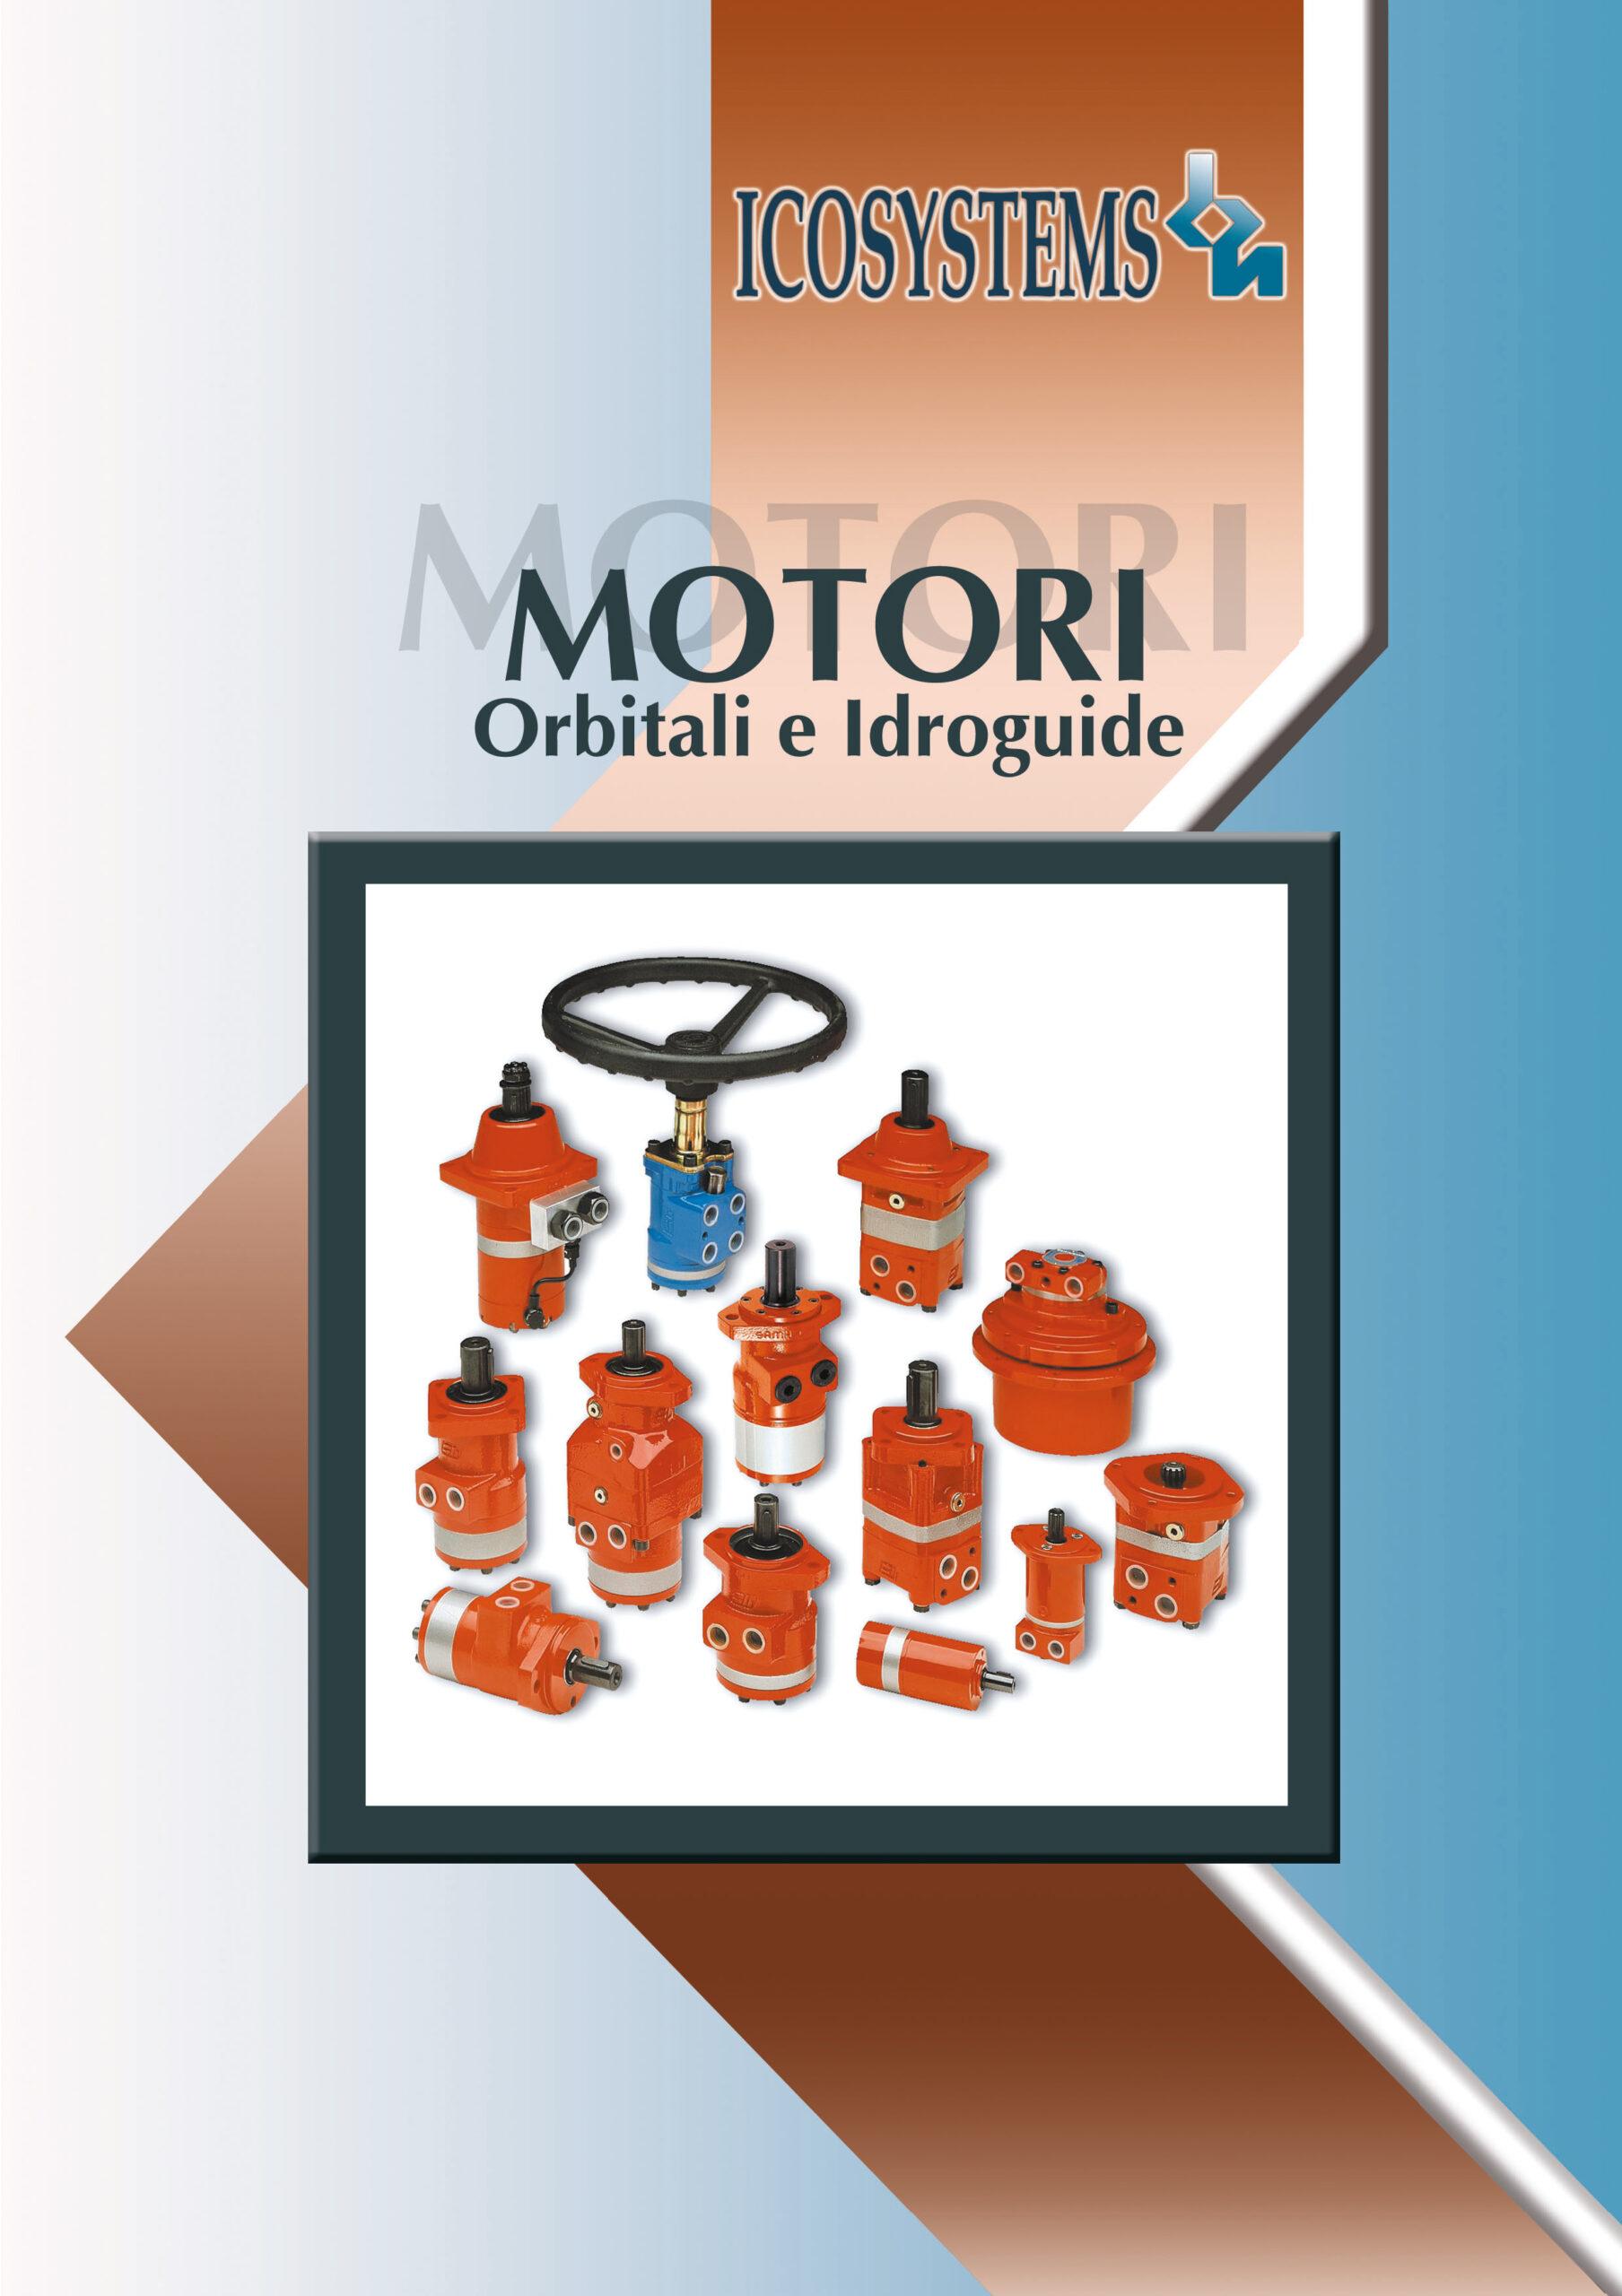 motori idraulici icosystems